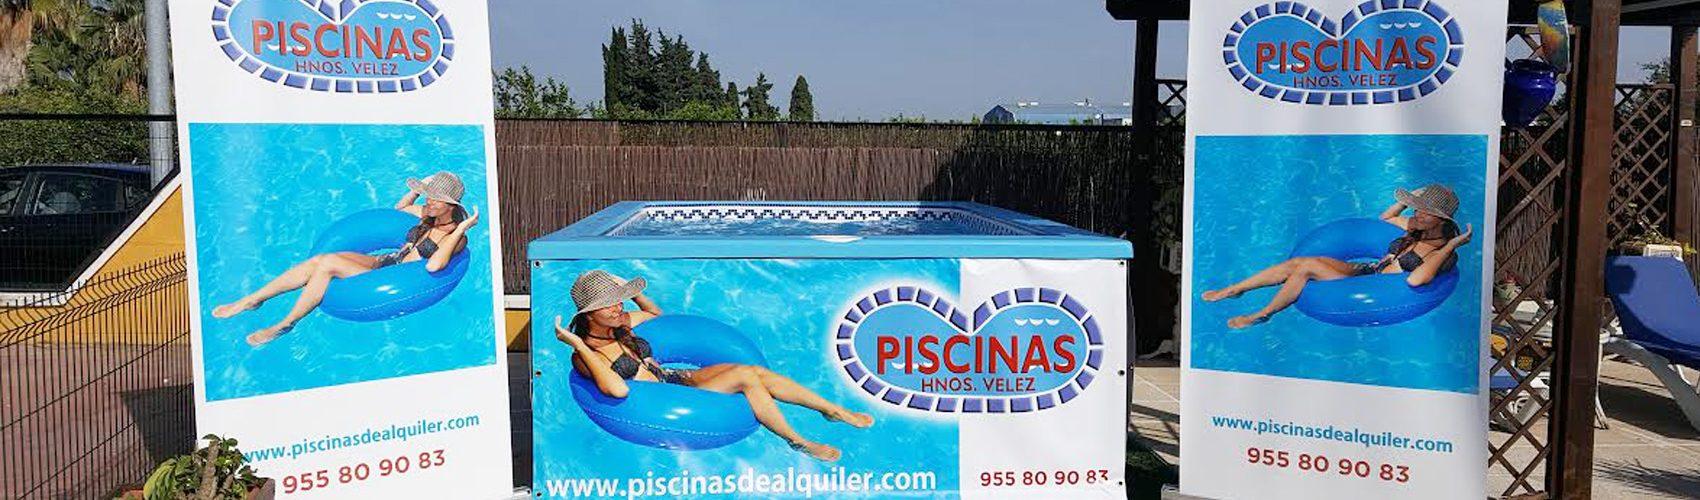 Alquiler de piscinas - Piscinas Vélez